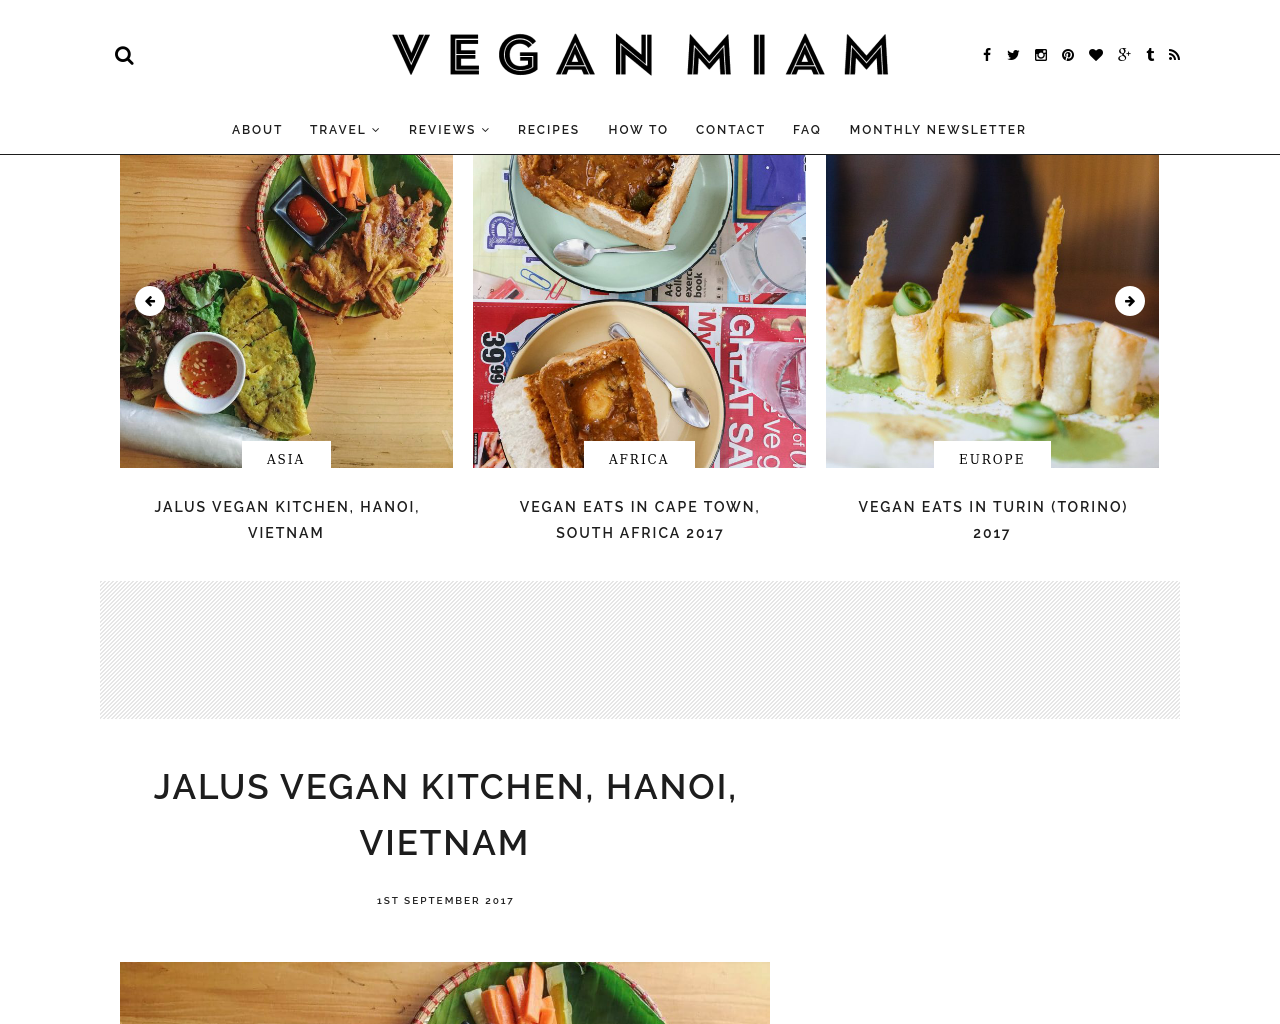 Vegan-Miam-Advertising-Reviews-Pricing